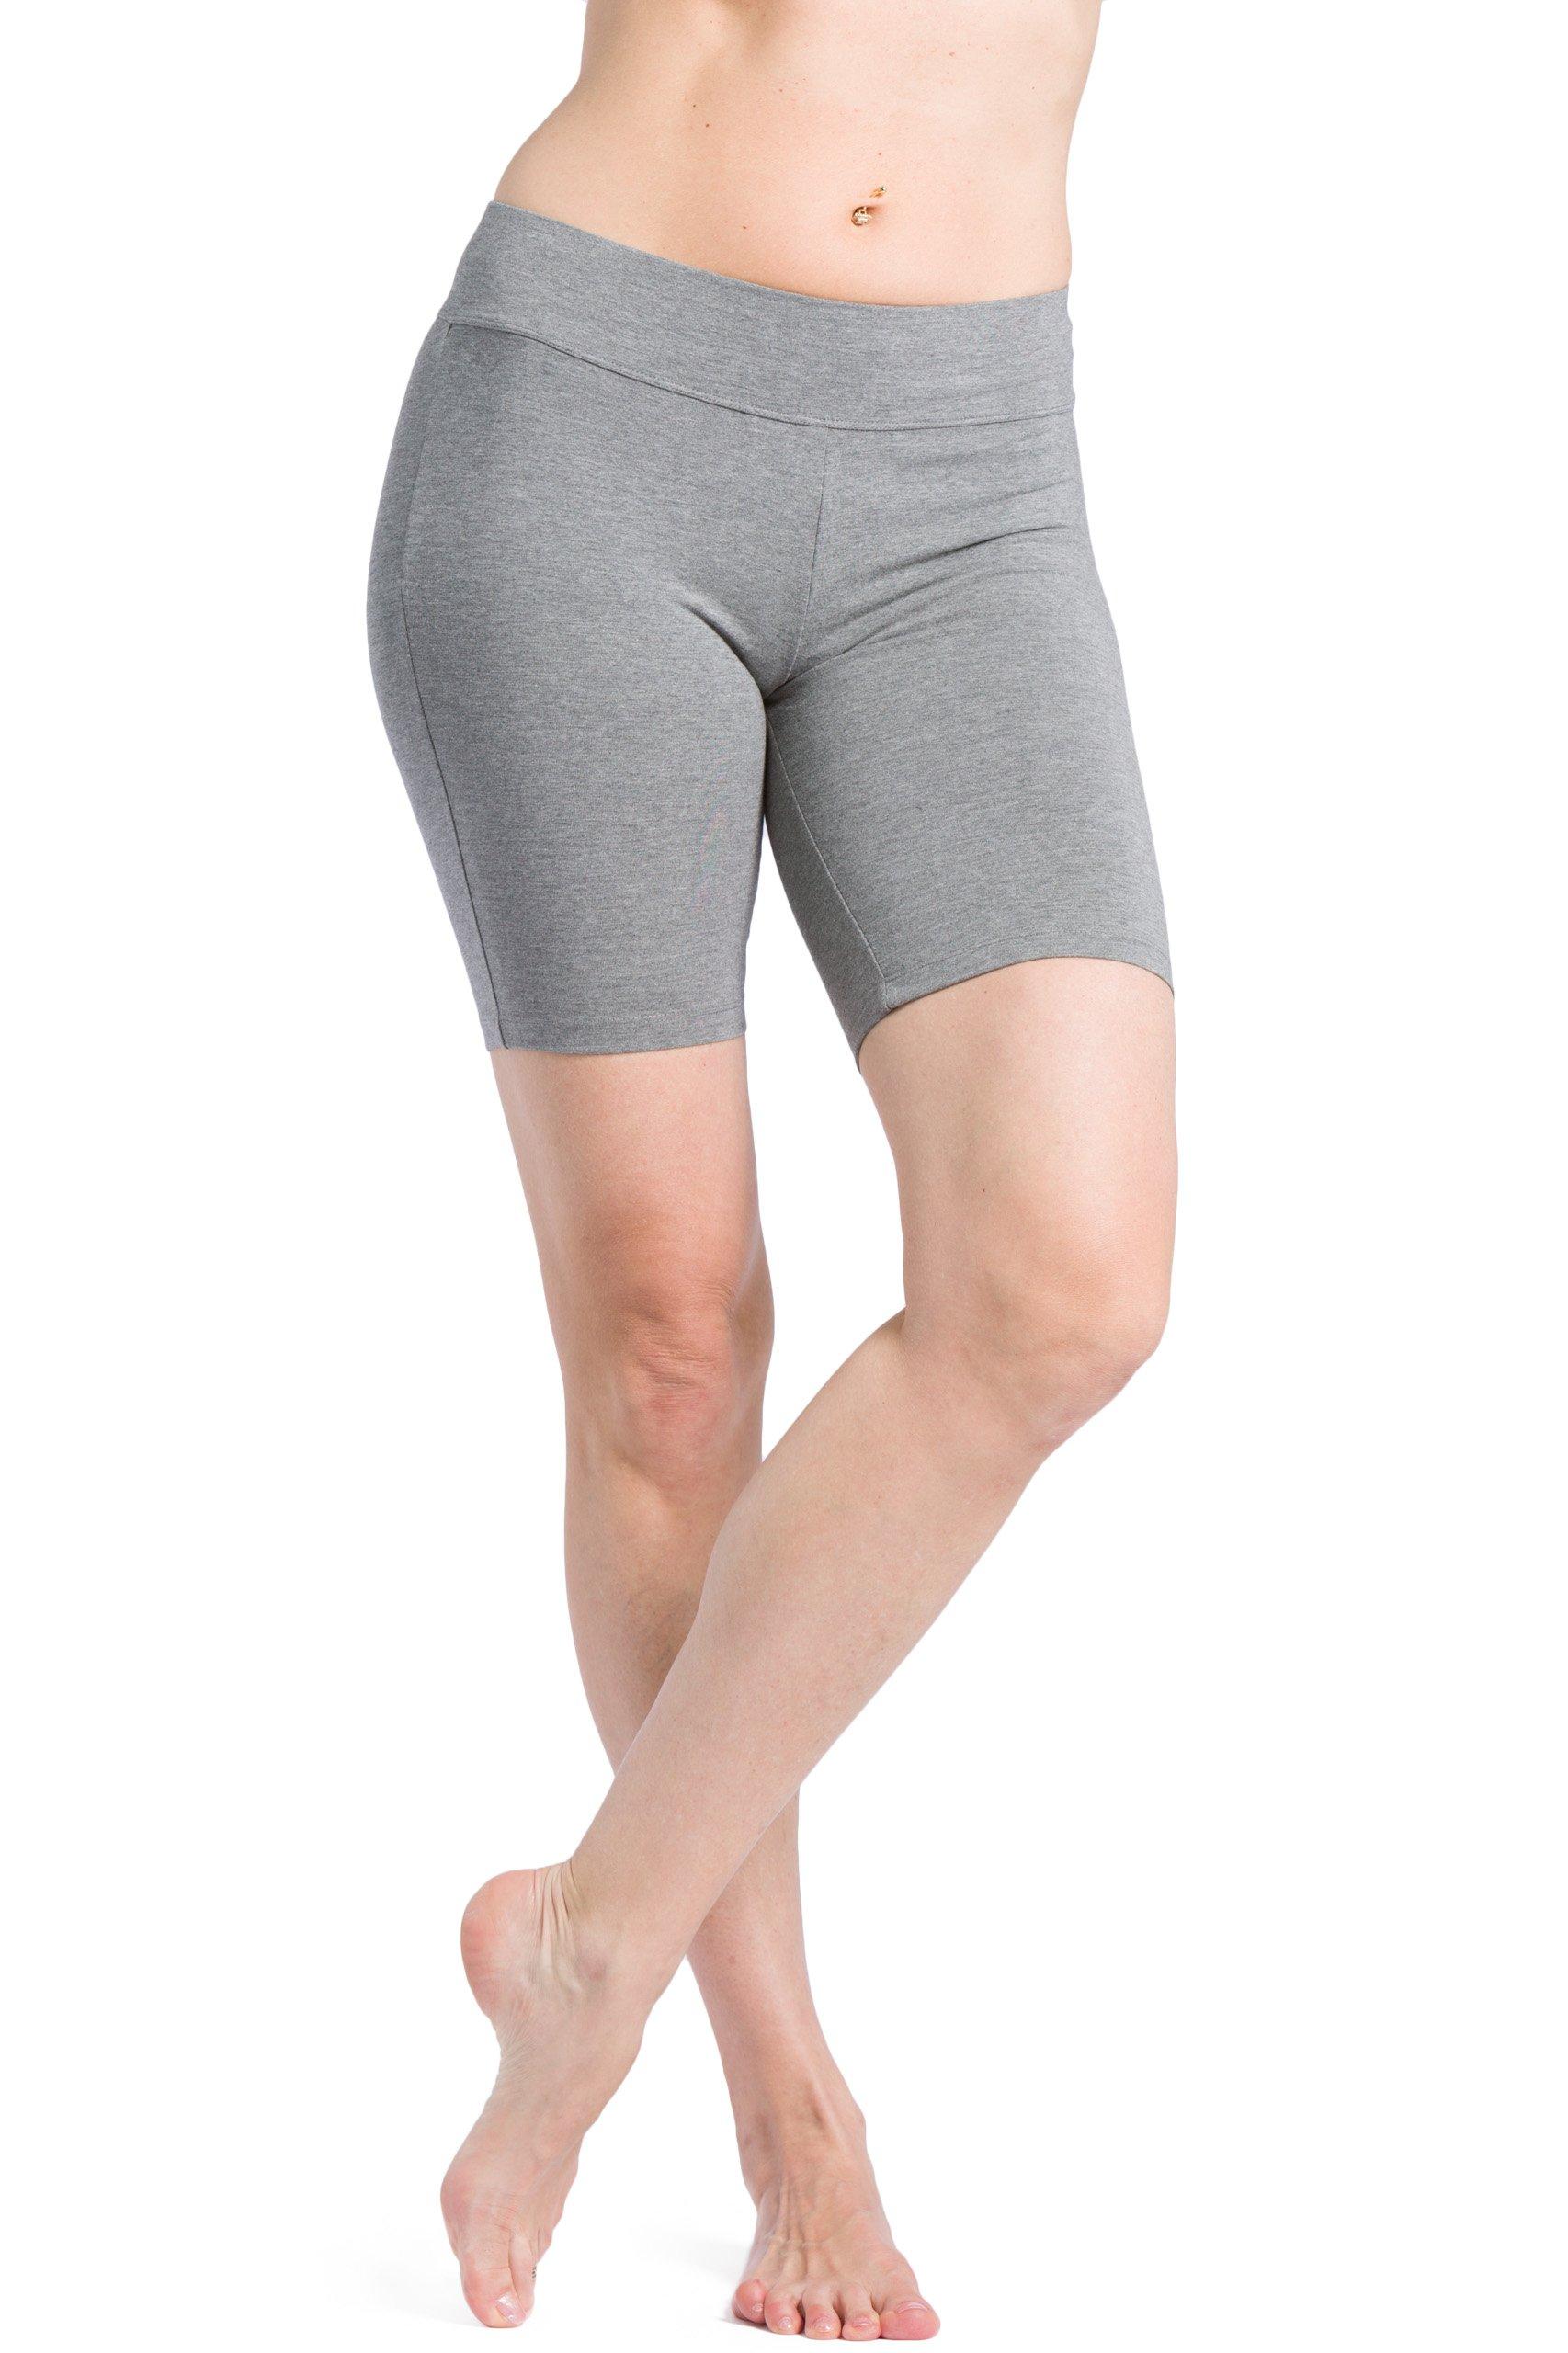 Fishers Finery Women's Ecofabric Classic Yoga Training Running Short; Mid Thigh